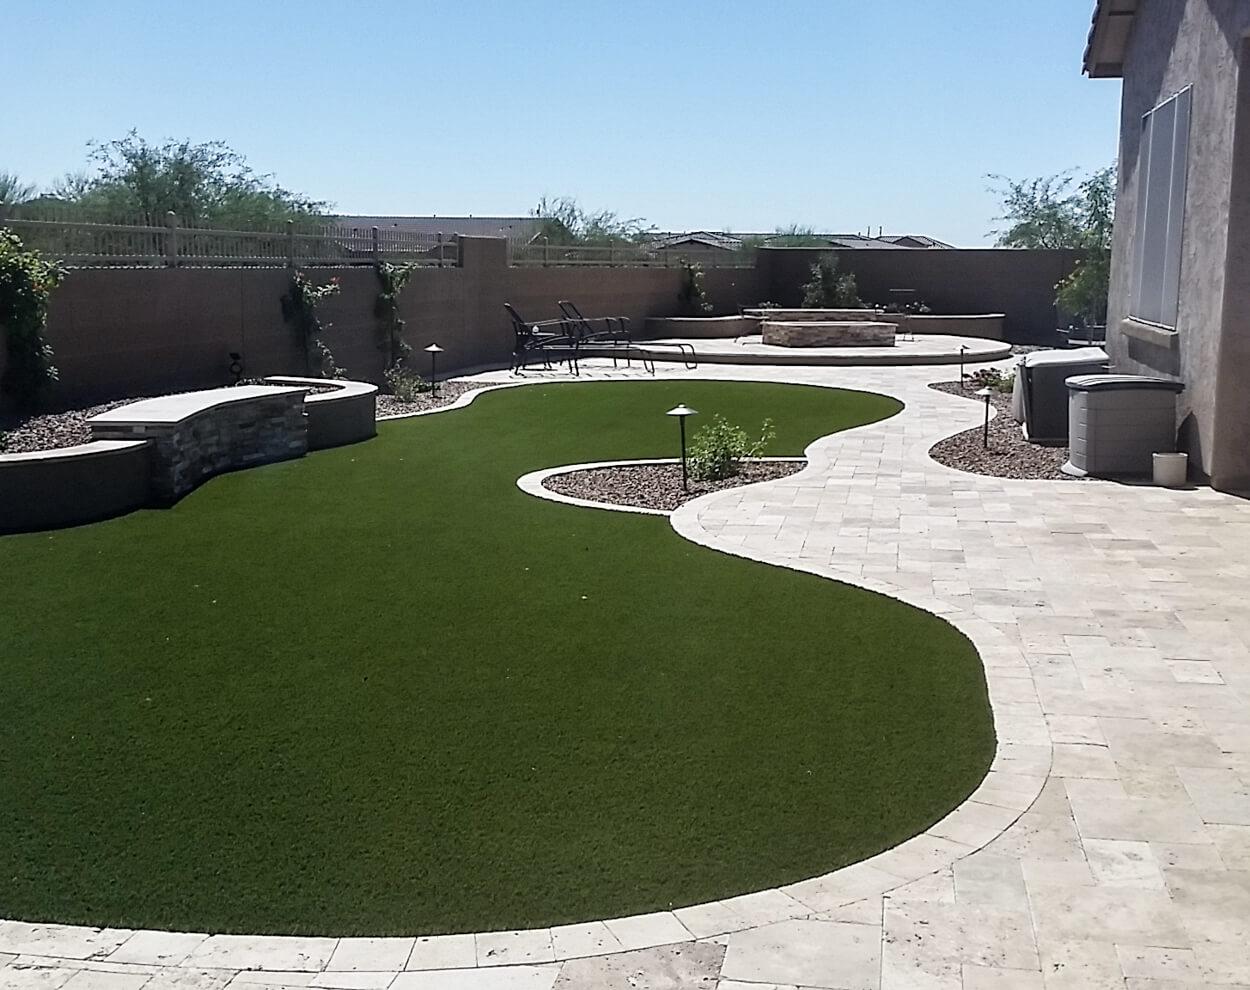 Lawn, Grass, Turf & Putting Greens in Phoenix, AZ - Photo Gallery